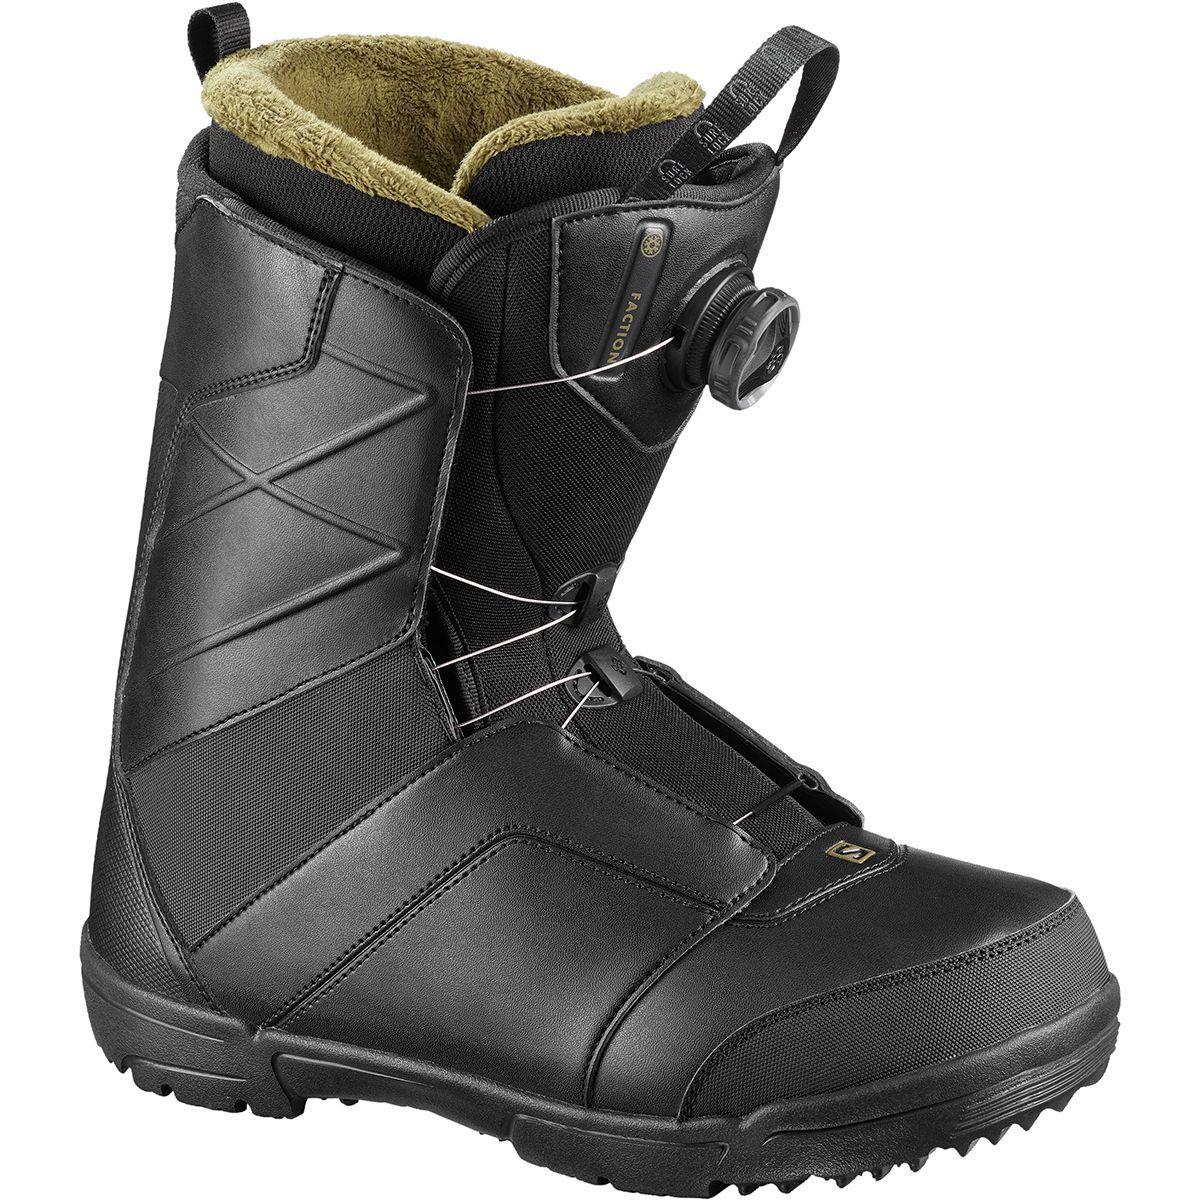 Salomon Faction Boa Snowboard Boot – Men's